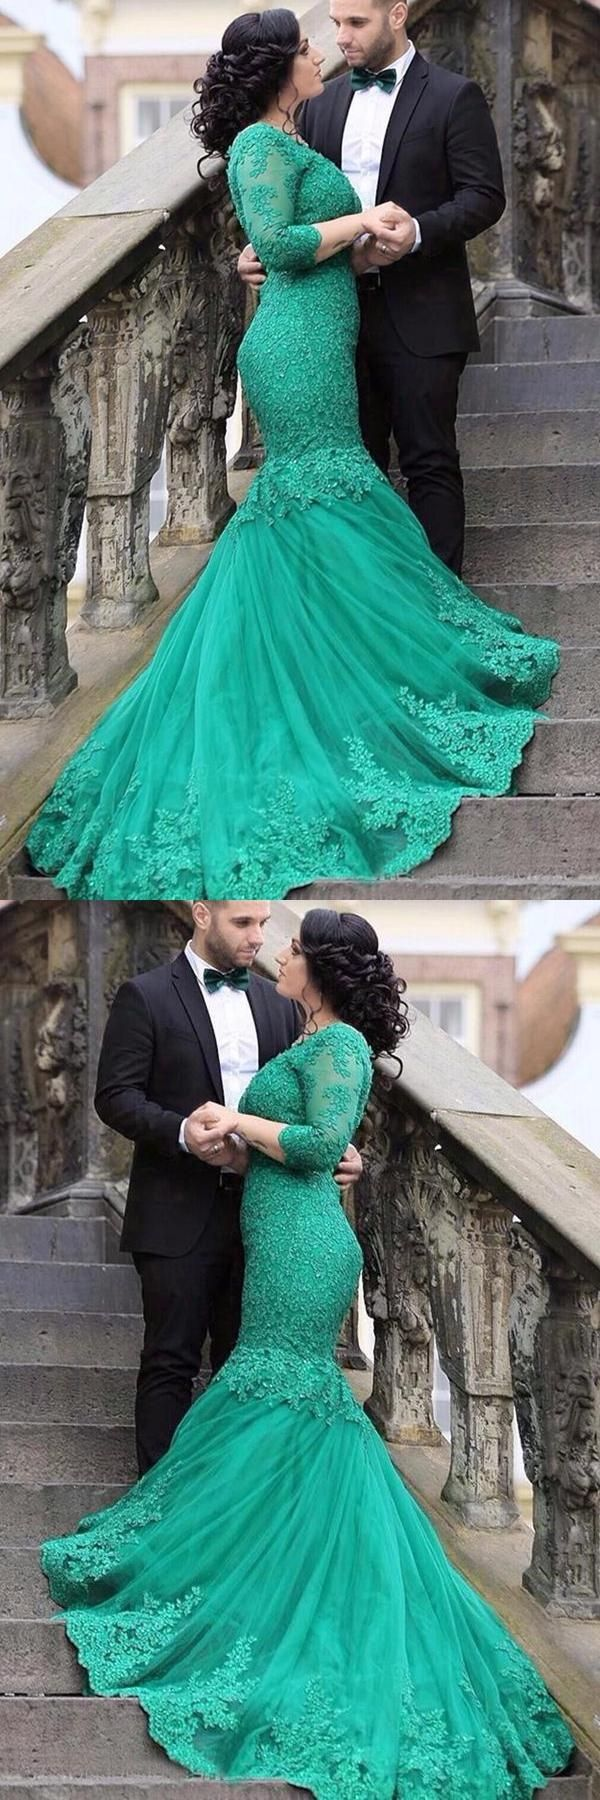 Mermaid prom dresses green prom dresses lace prom dresses long